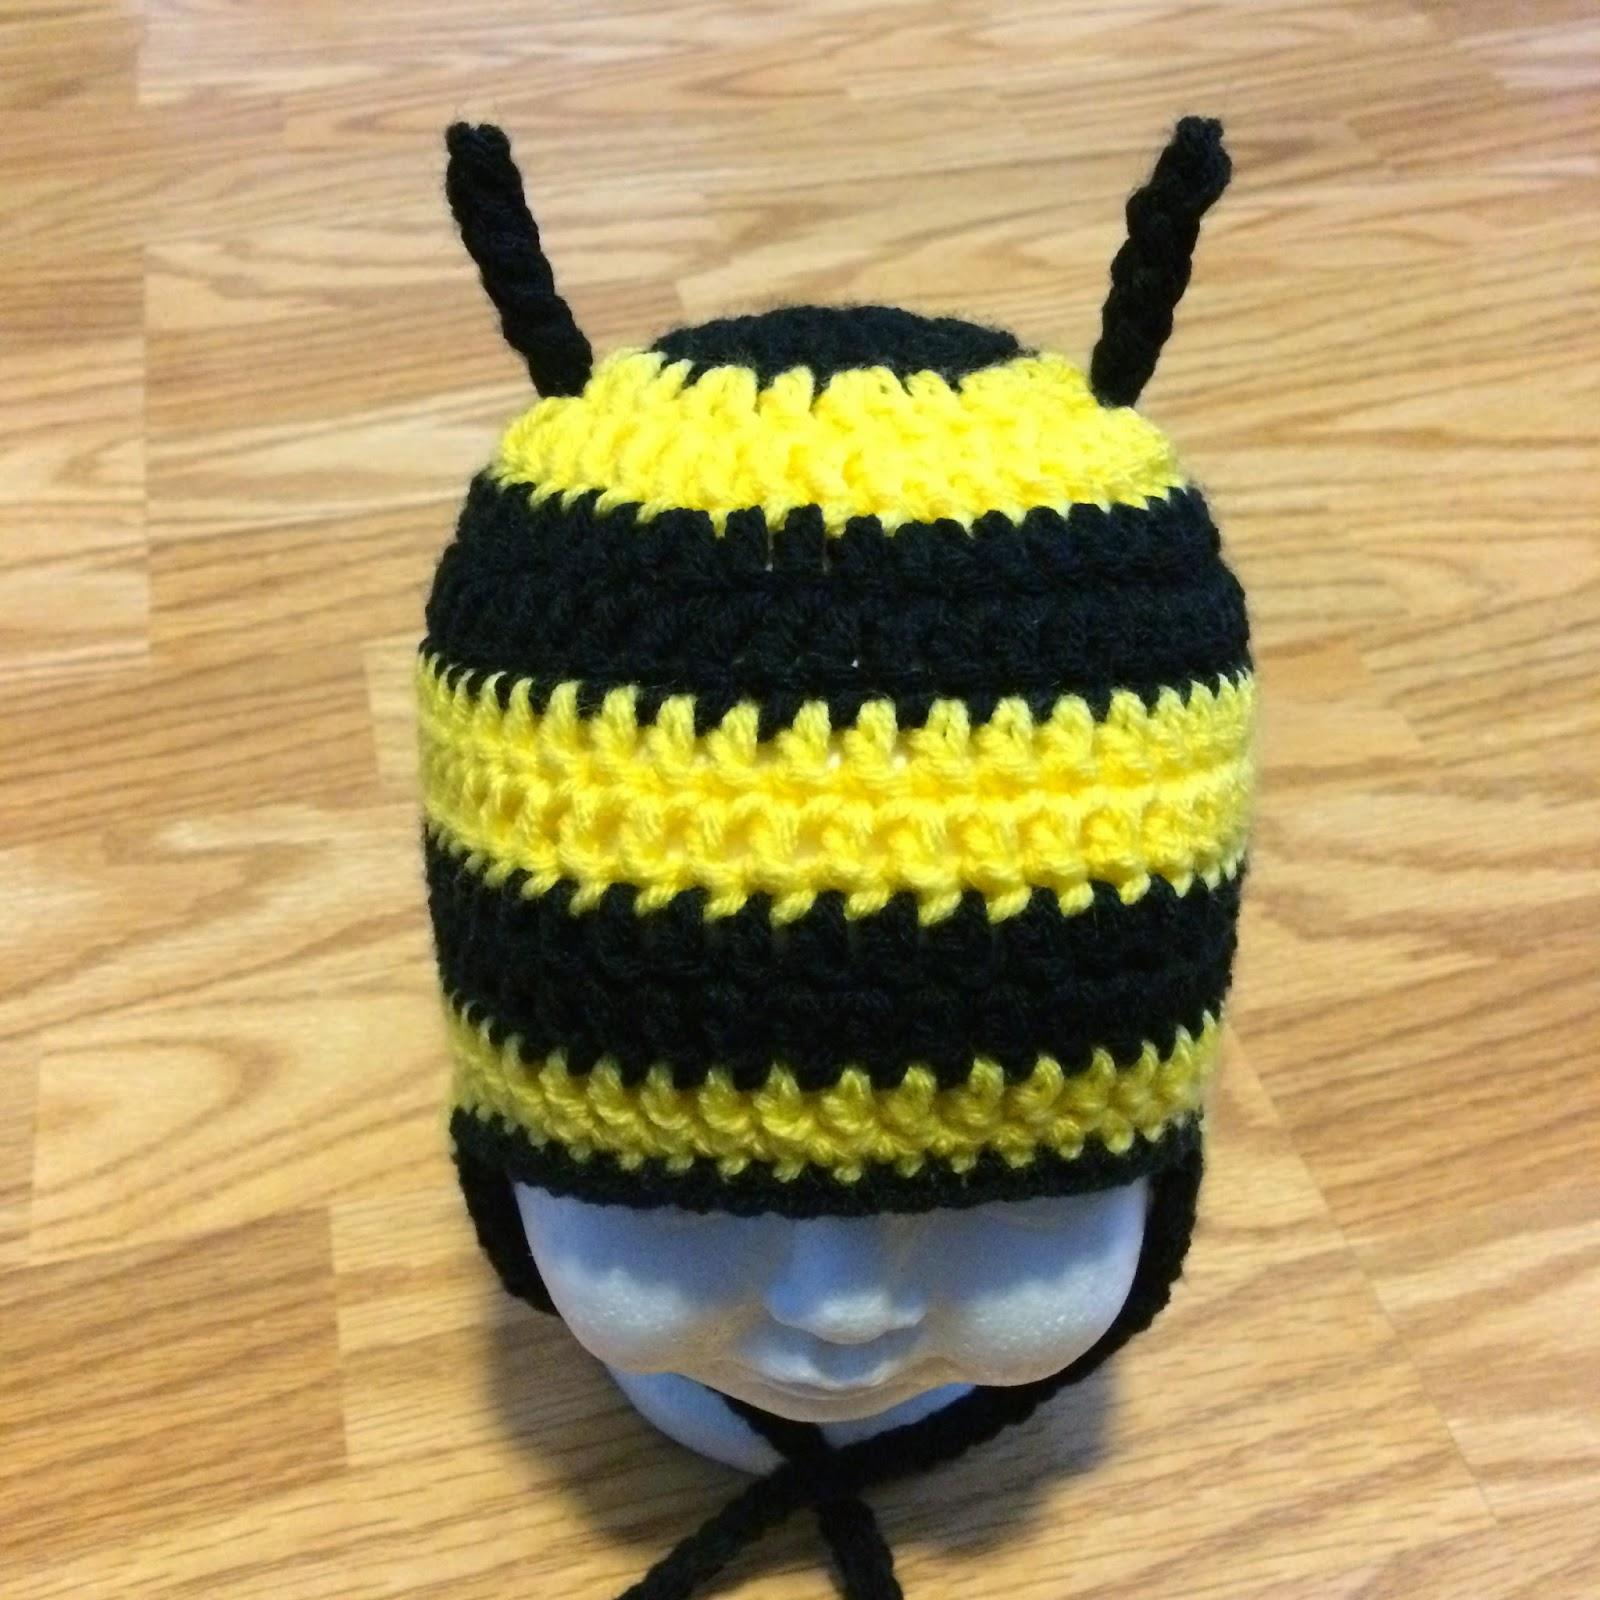 Danyel Pink Designs: Crochet Tip: Bug Antennae